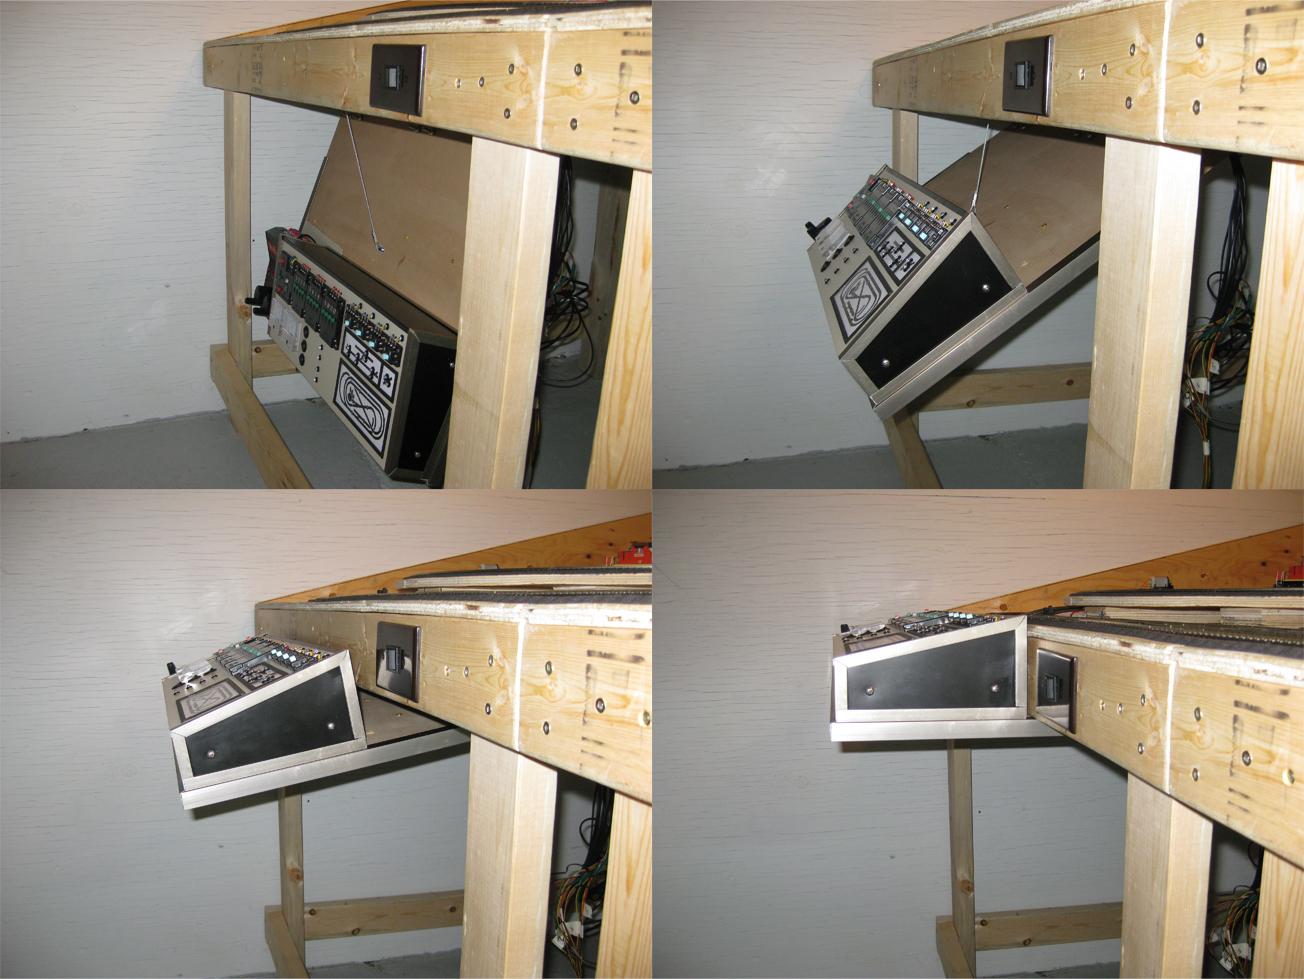 ty u0026 39 s model railroad  control panel winch system